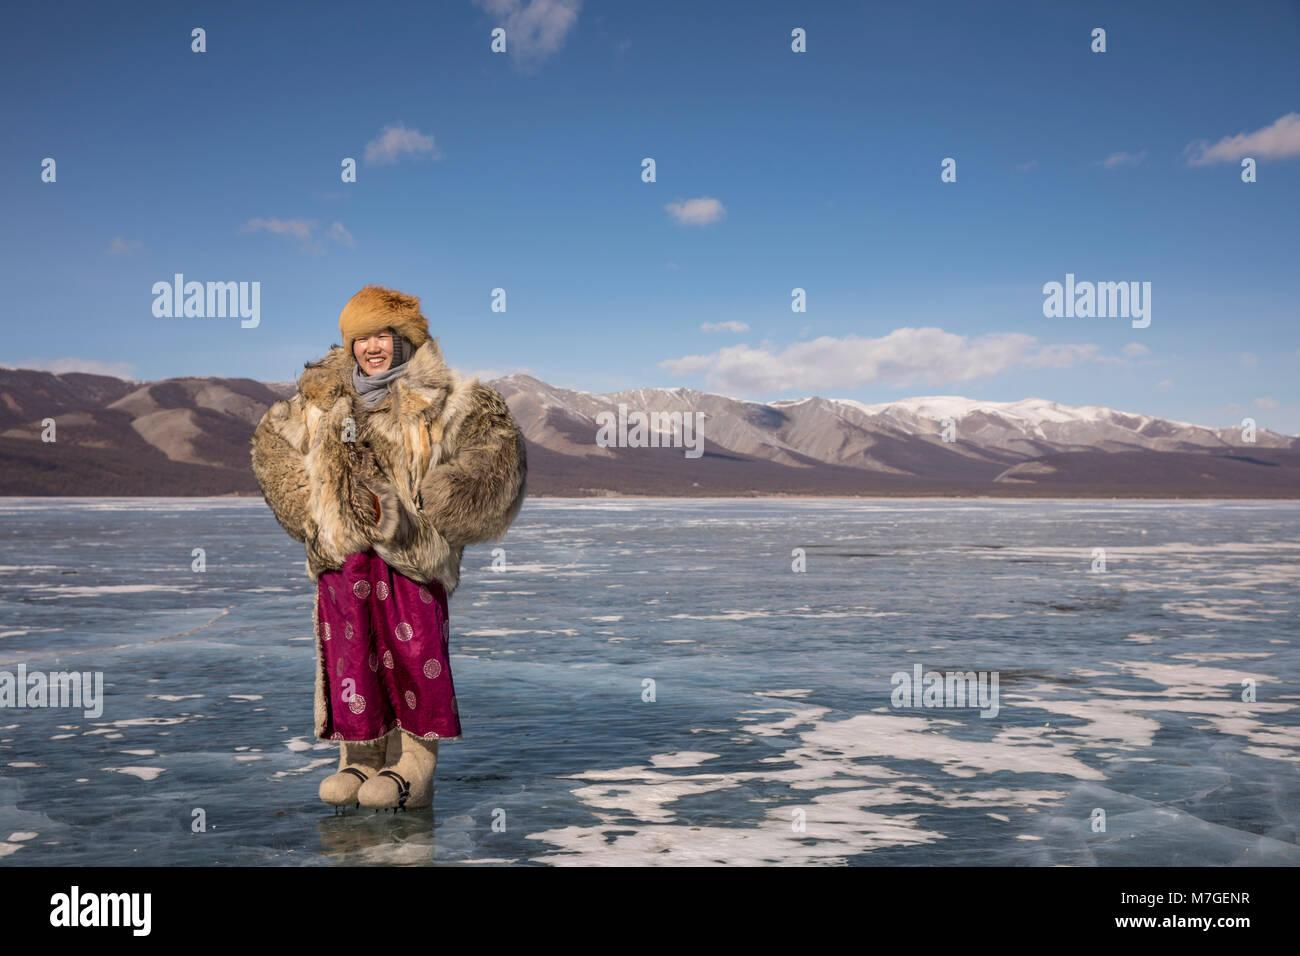 Joven dama mongola en wolfskin chaqueta en un lago congelado Khovsgol en el norte de Mongolia Imagen De Stock